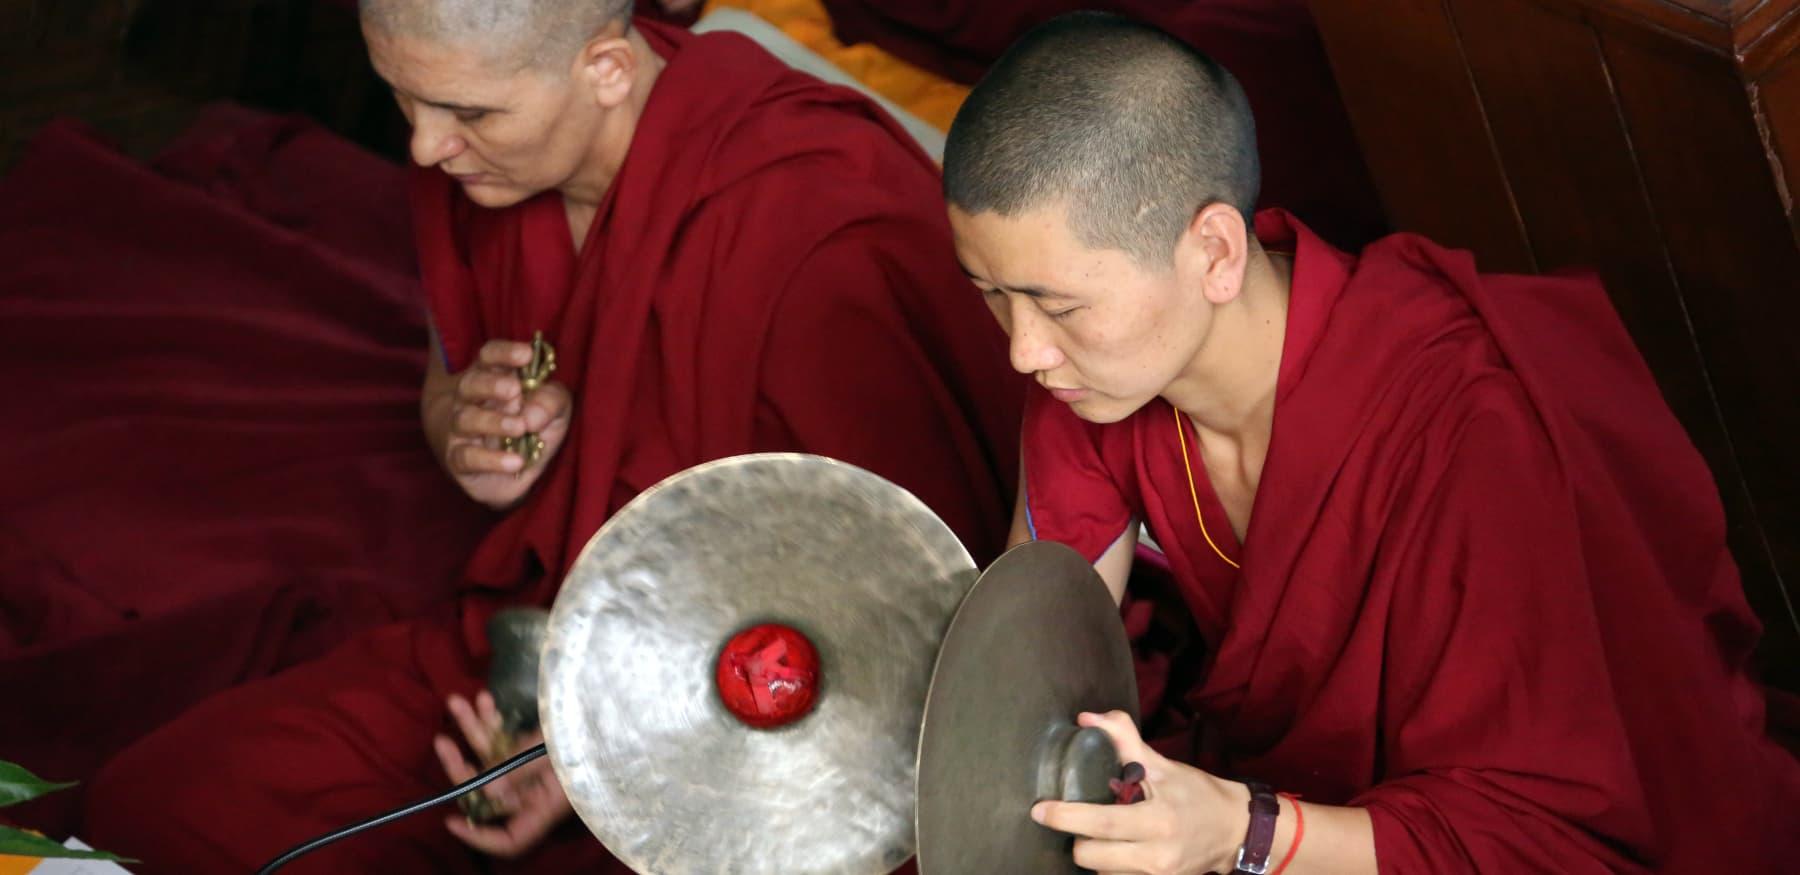 Kloster Indien Dharamsala